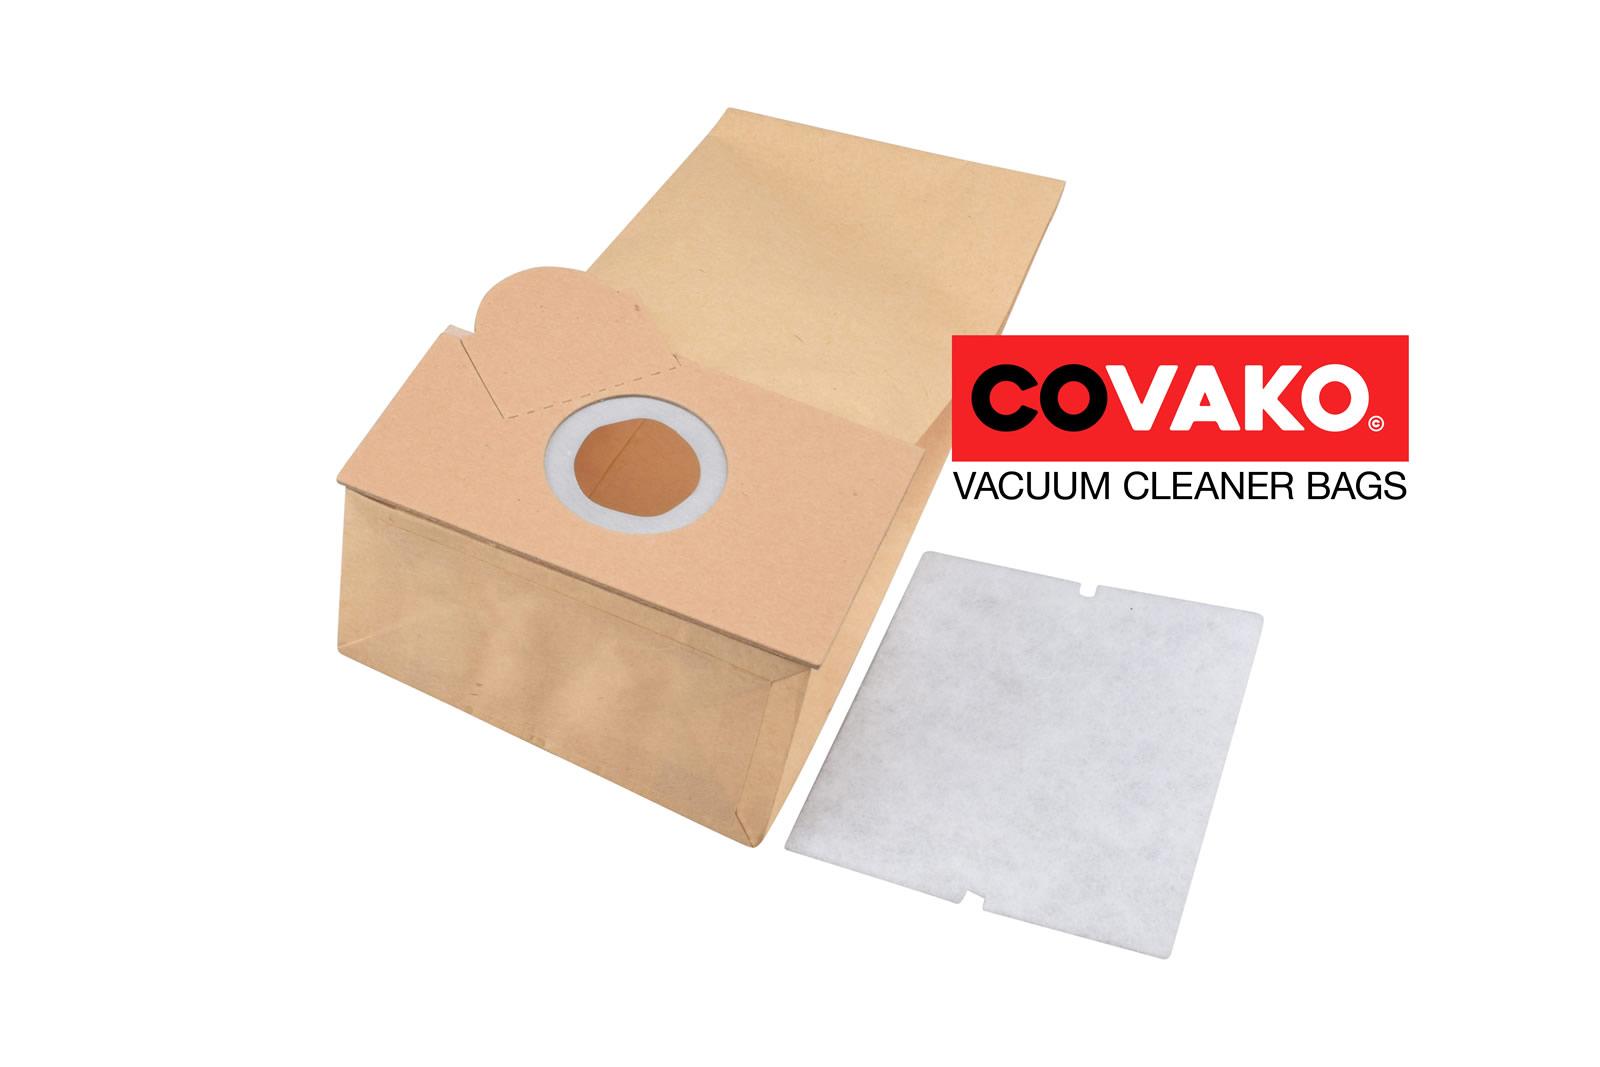 Nilco 1505 Ultra Saugaggregat / Paper - Nilco vacuum cleaner bags